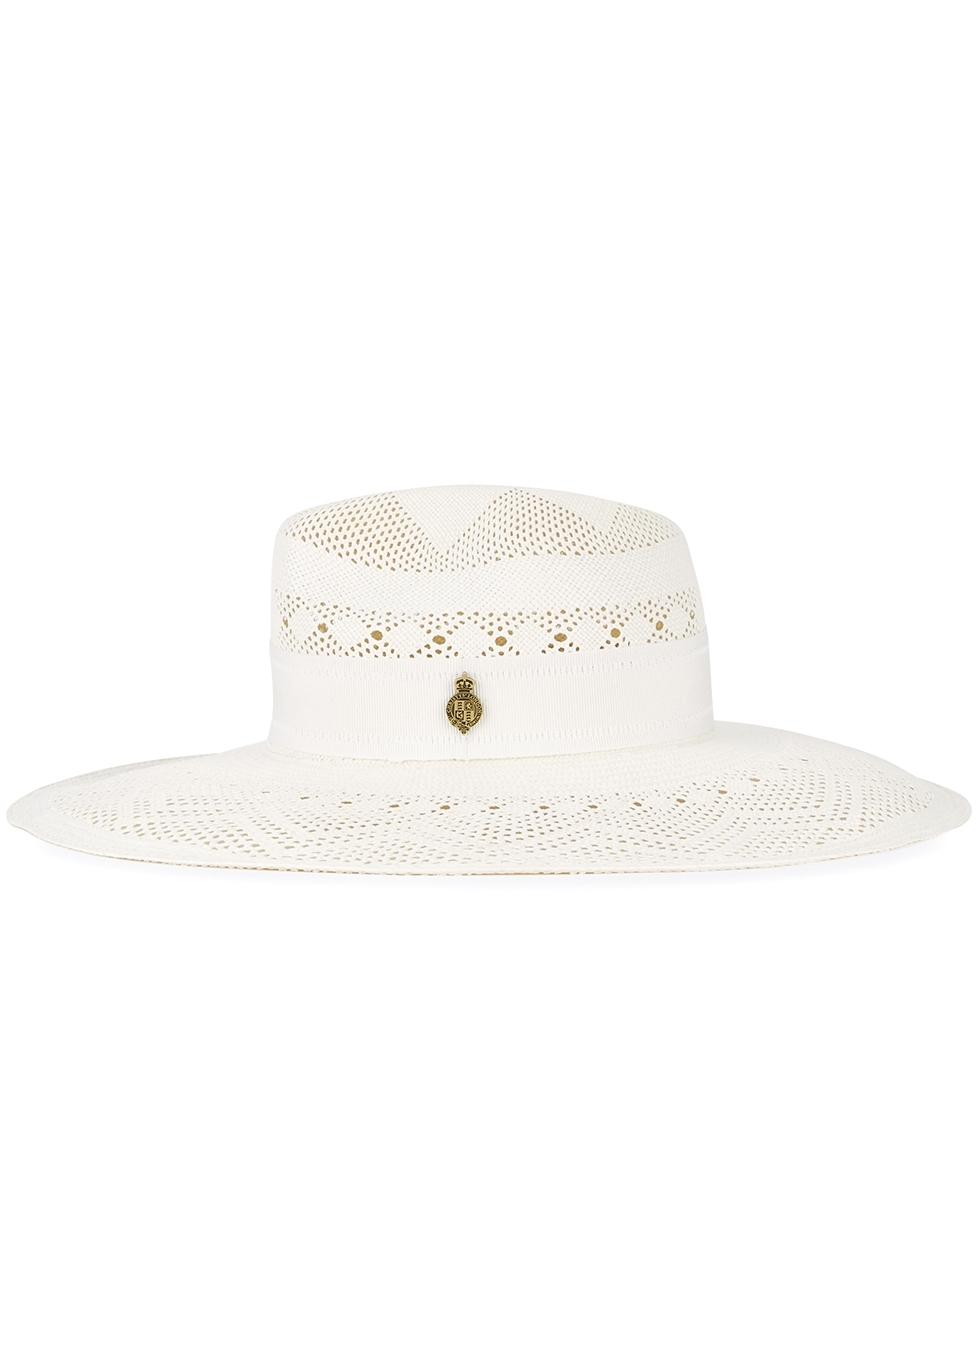 edbd9f4baeec3 Women s Designer Hats